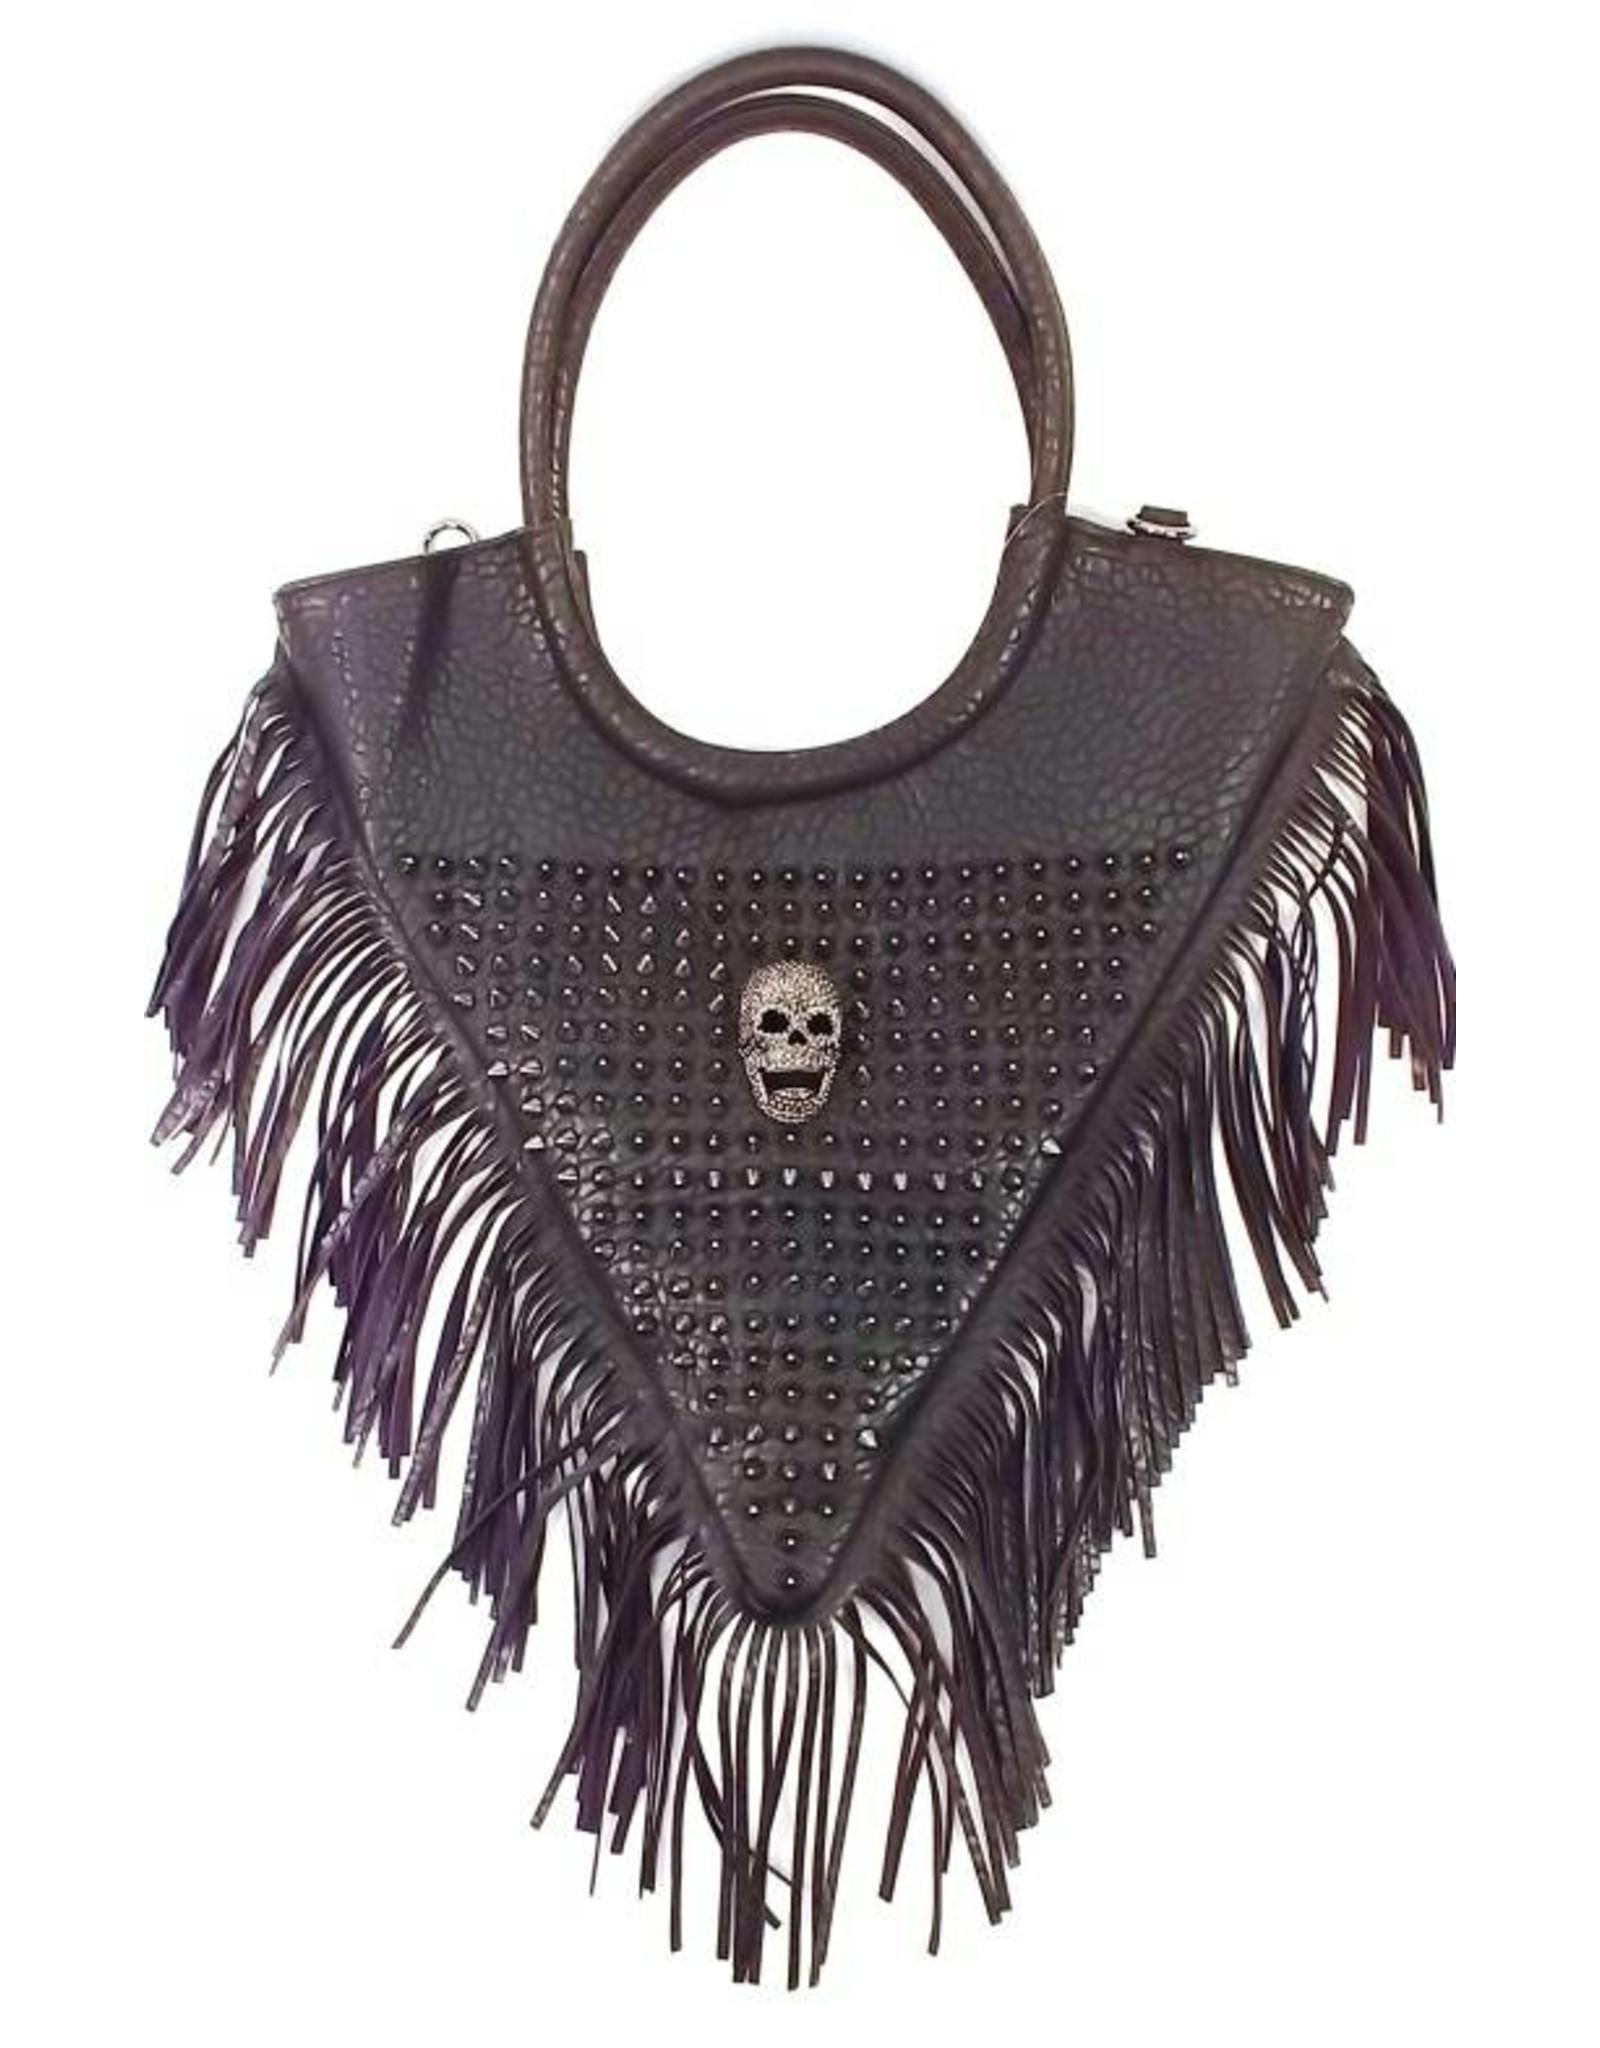 Dark Desire Gothic bags Steampunk bags - Gothic shoulder bag Triangle